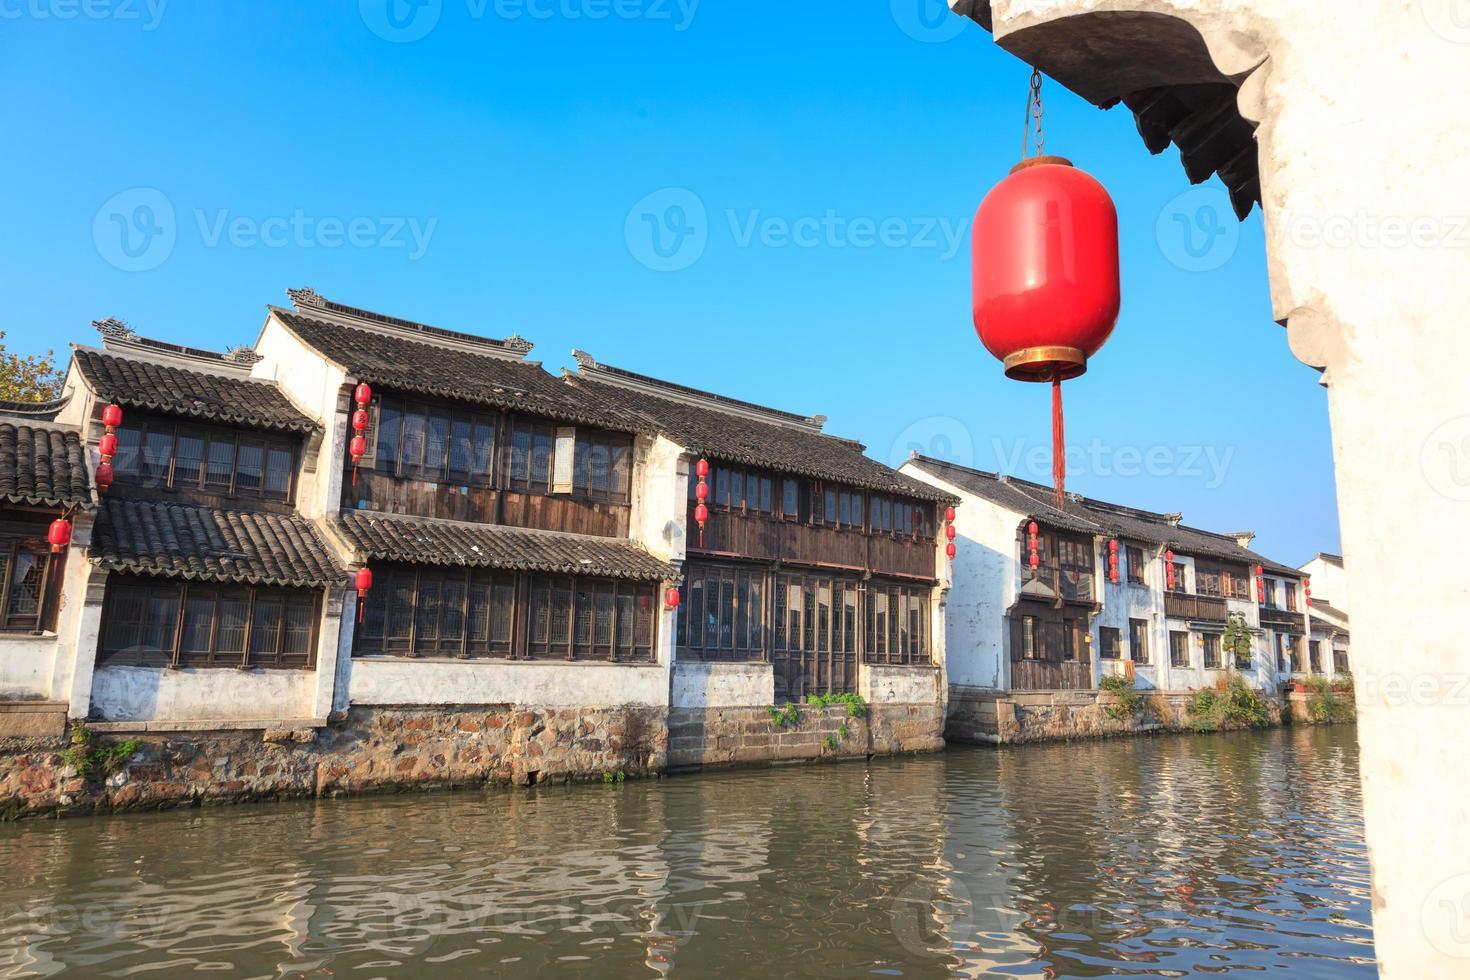 Vieille ville traditionnelle chinoise par le Grand Canal, Suzhou, Chine photo